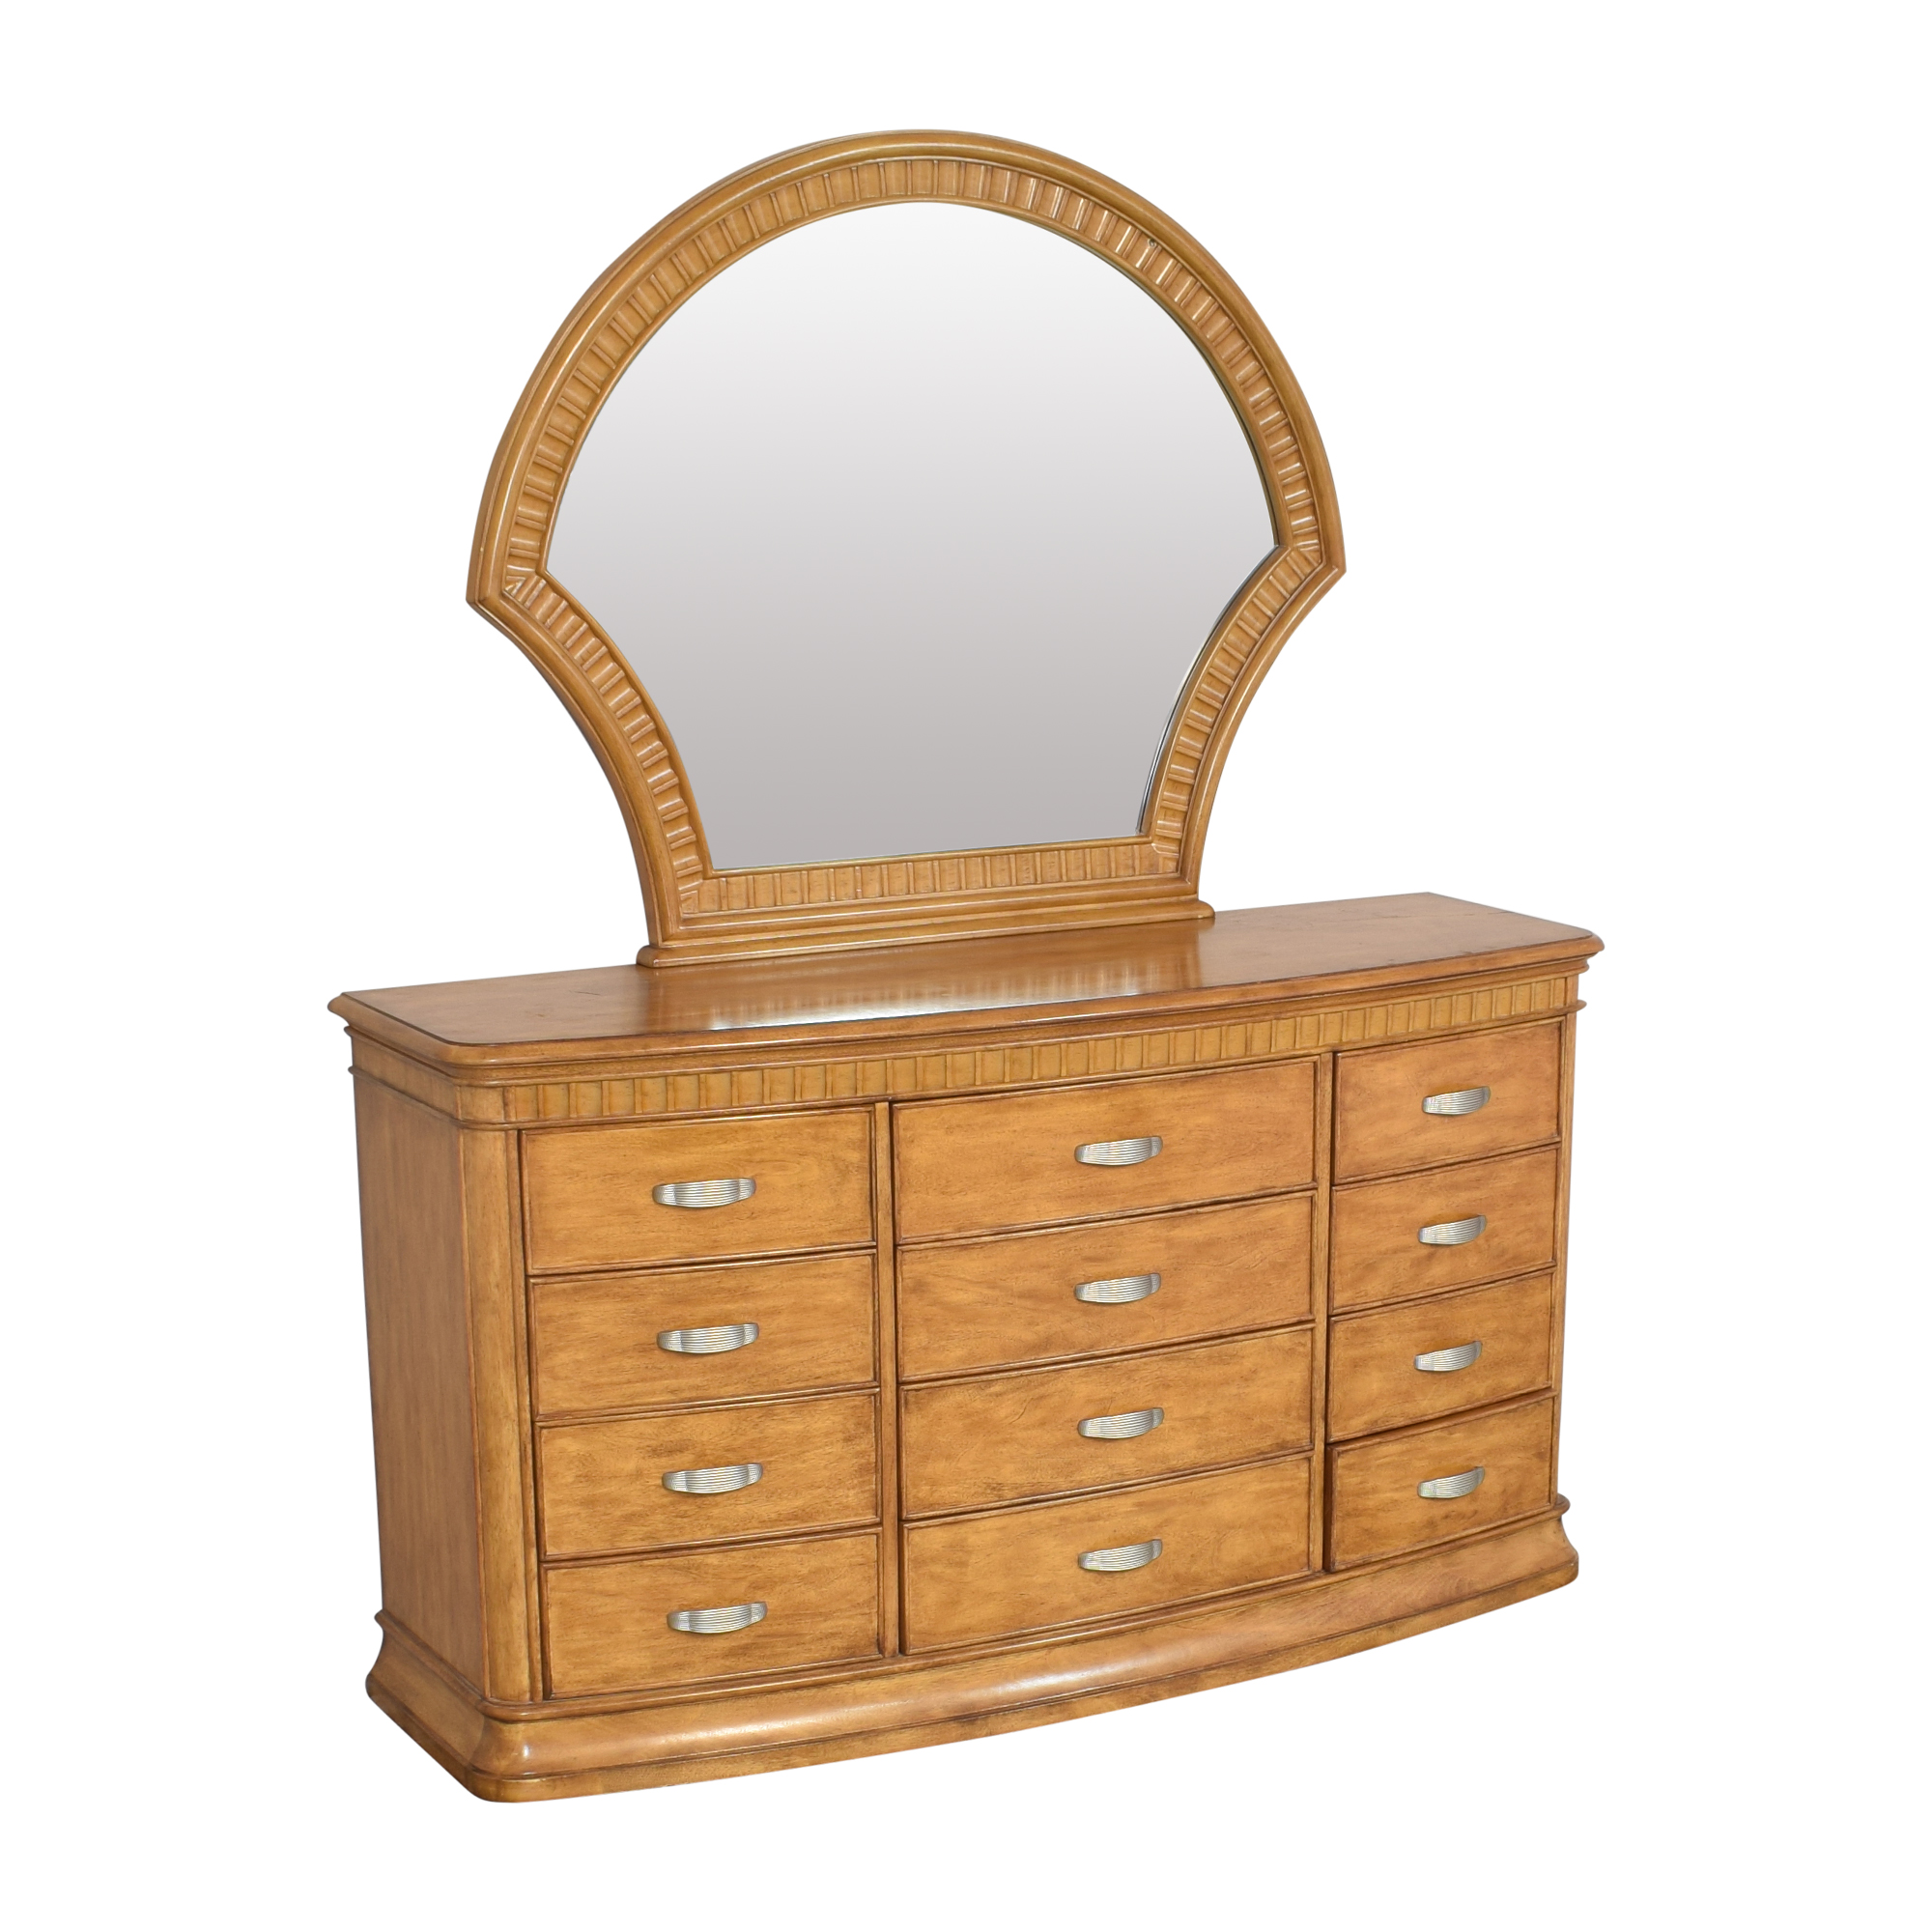 Triple Dresser Vanity with Mirror Dressers